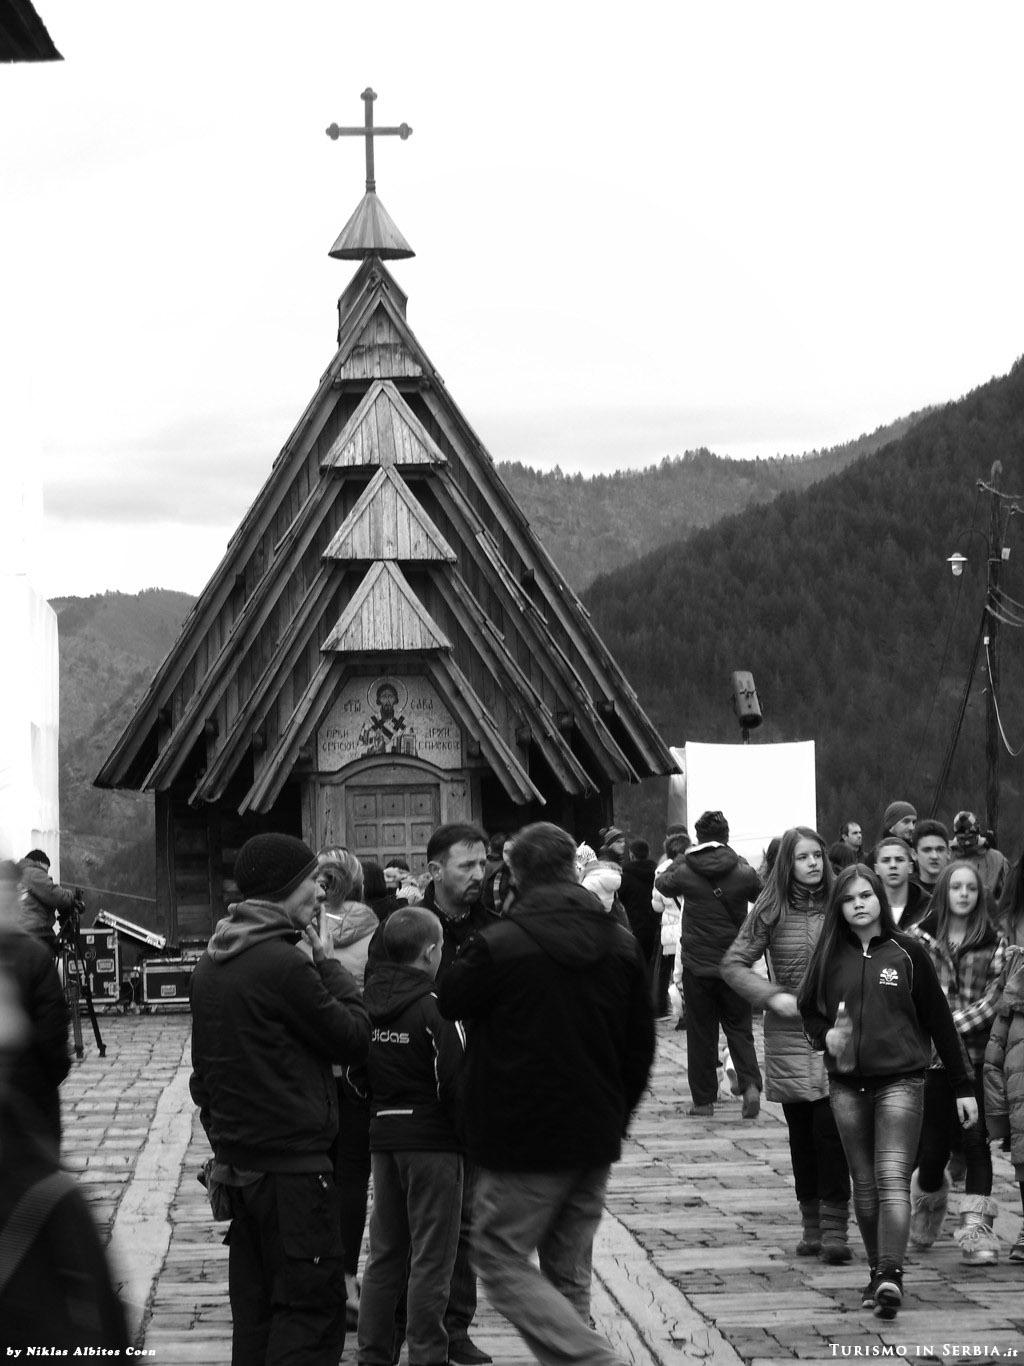 09 - Küstendorf Film & Music Festival [GALLERY]